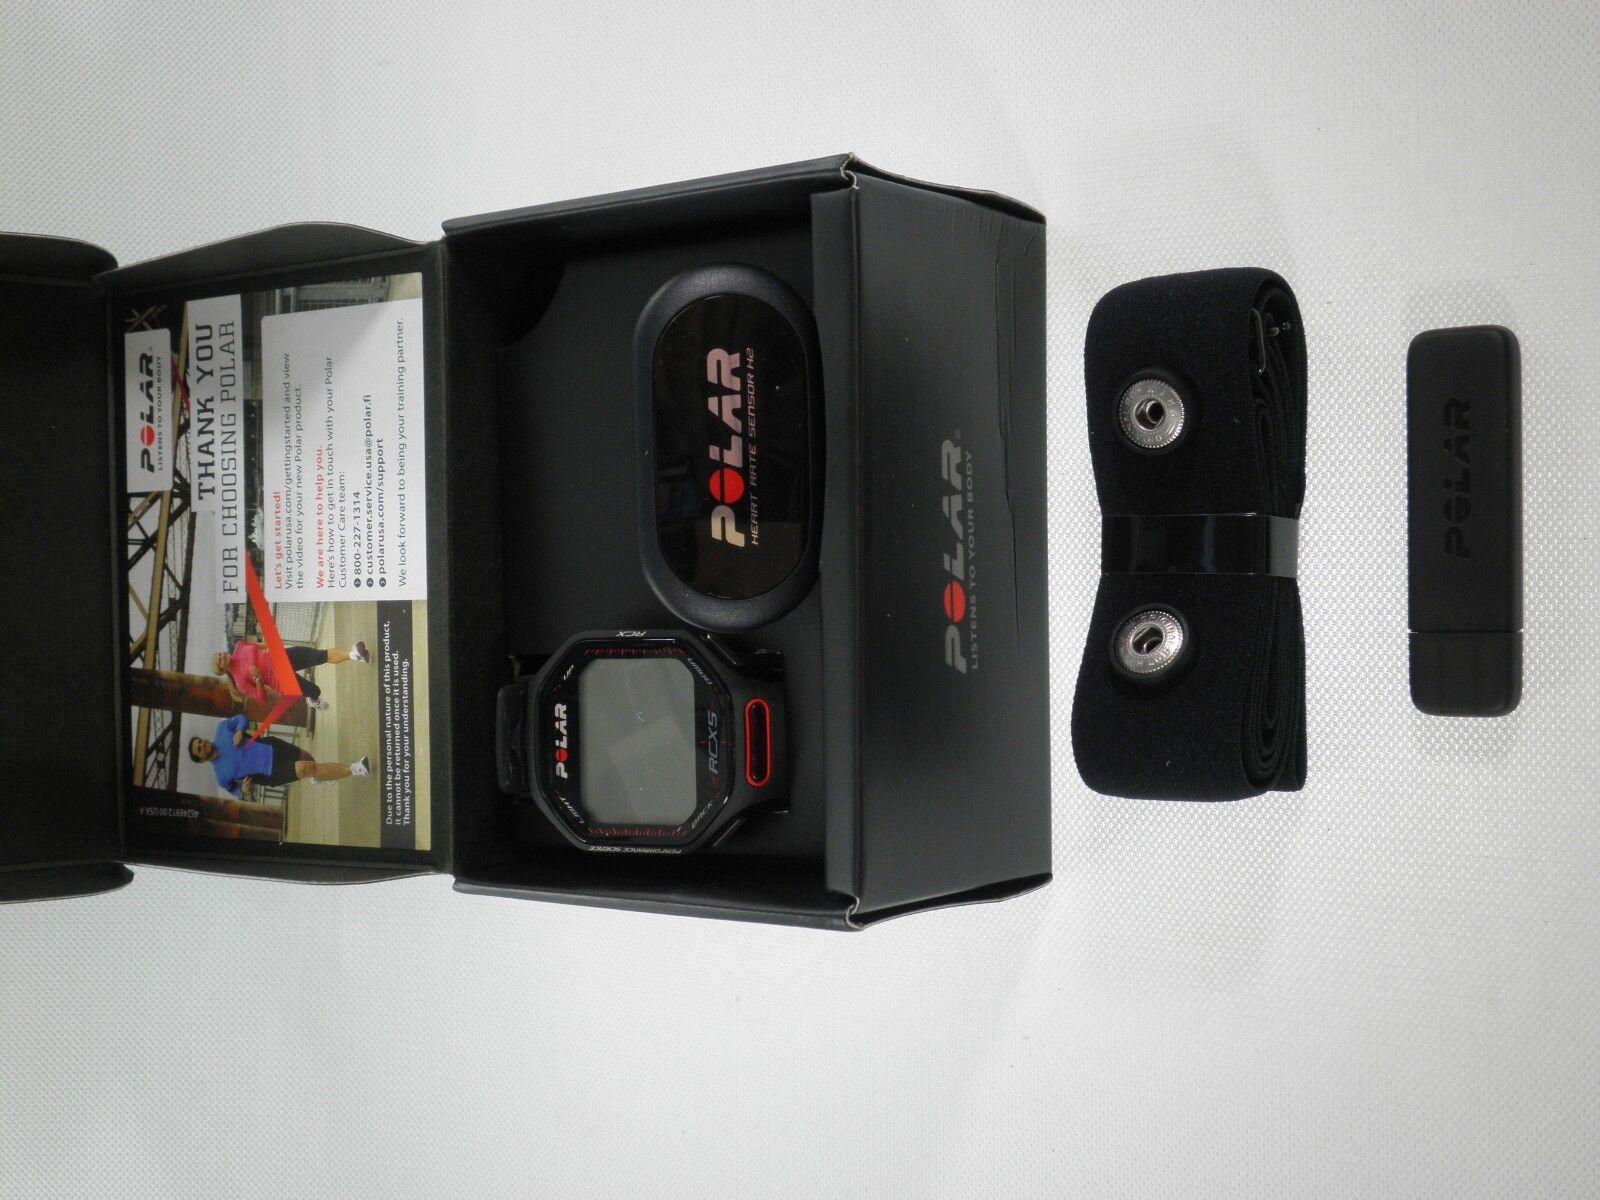 Monitor de ritmo cardíaco Polar RCX5 Negro Deporte Correr Bicicleta Bicicleta Bicicleta De Ejercicio Fitness 90038881 e08651